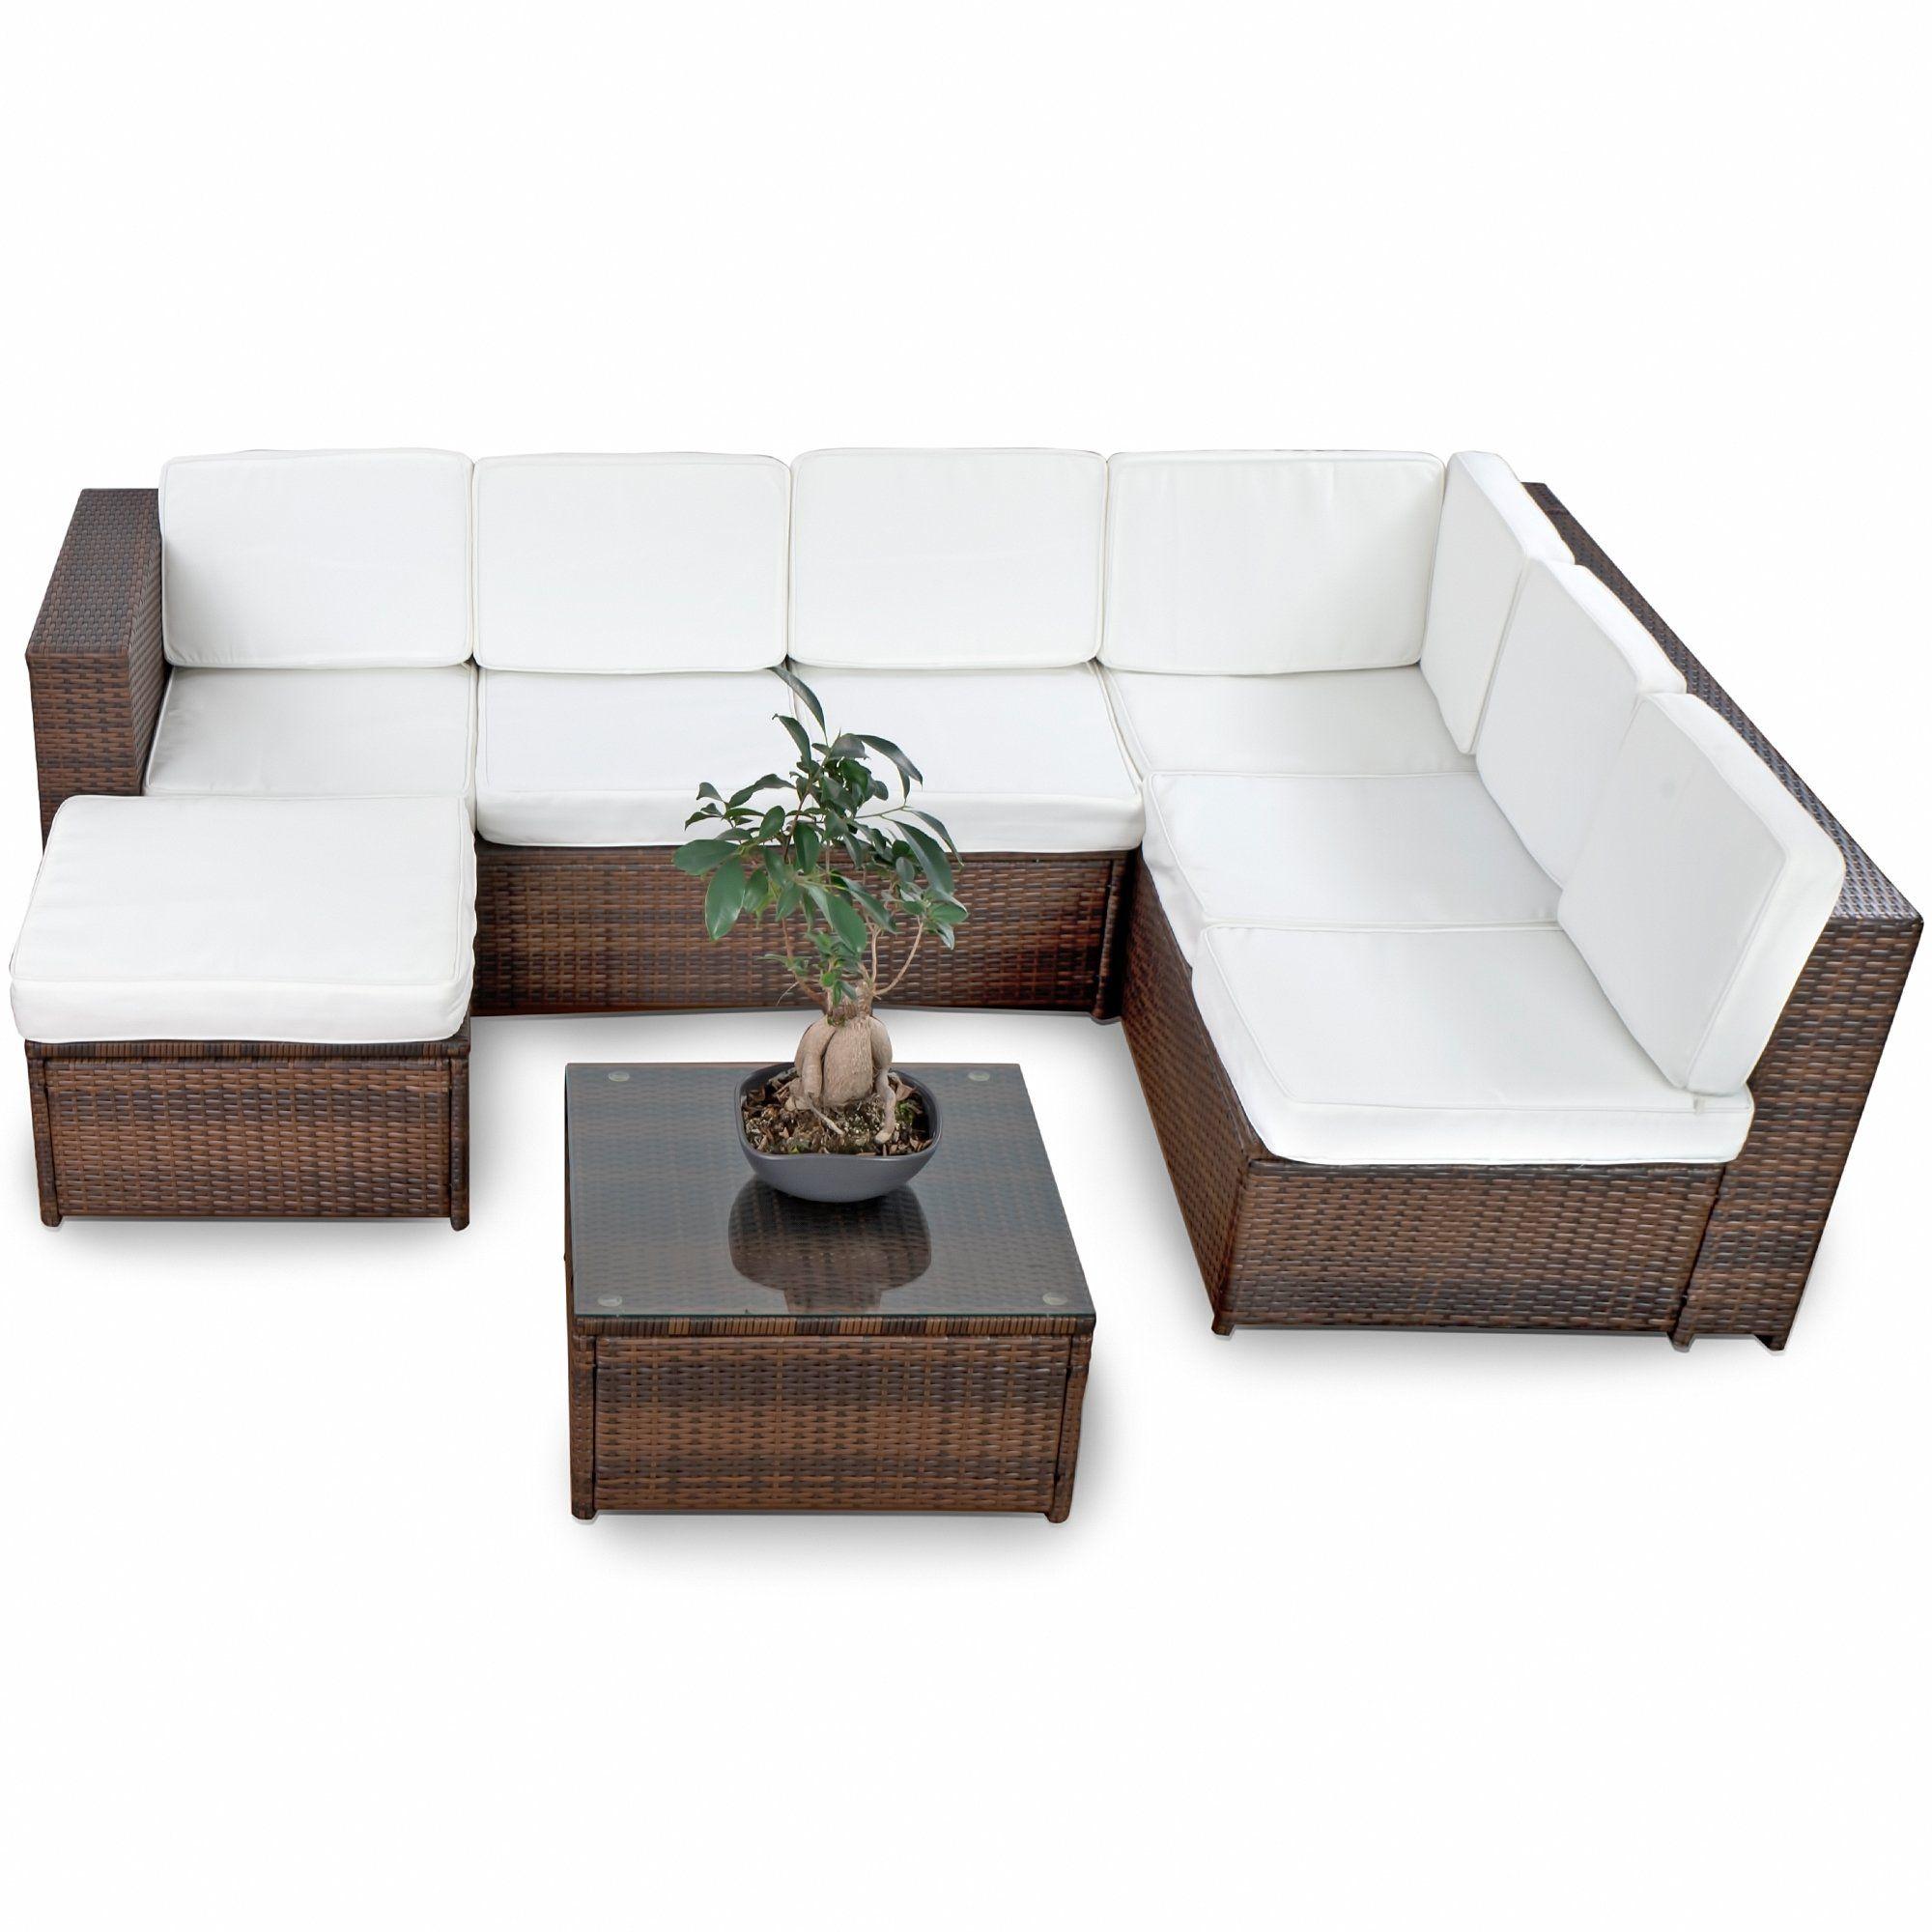 XINRO 19tlg XXXL Polyrattan Gartenmbel Lounge Sofa